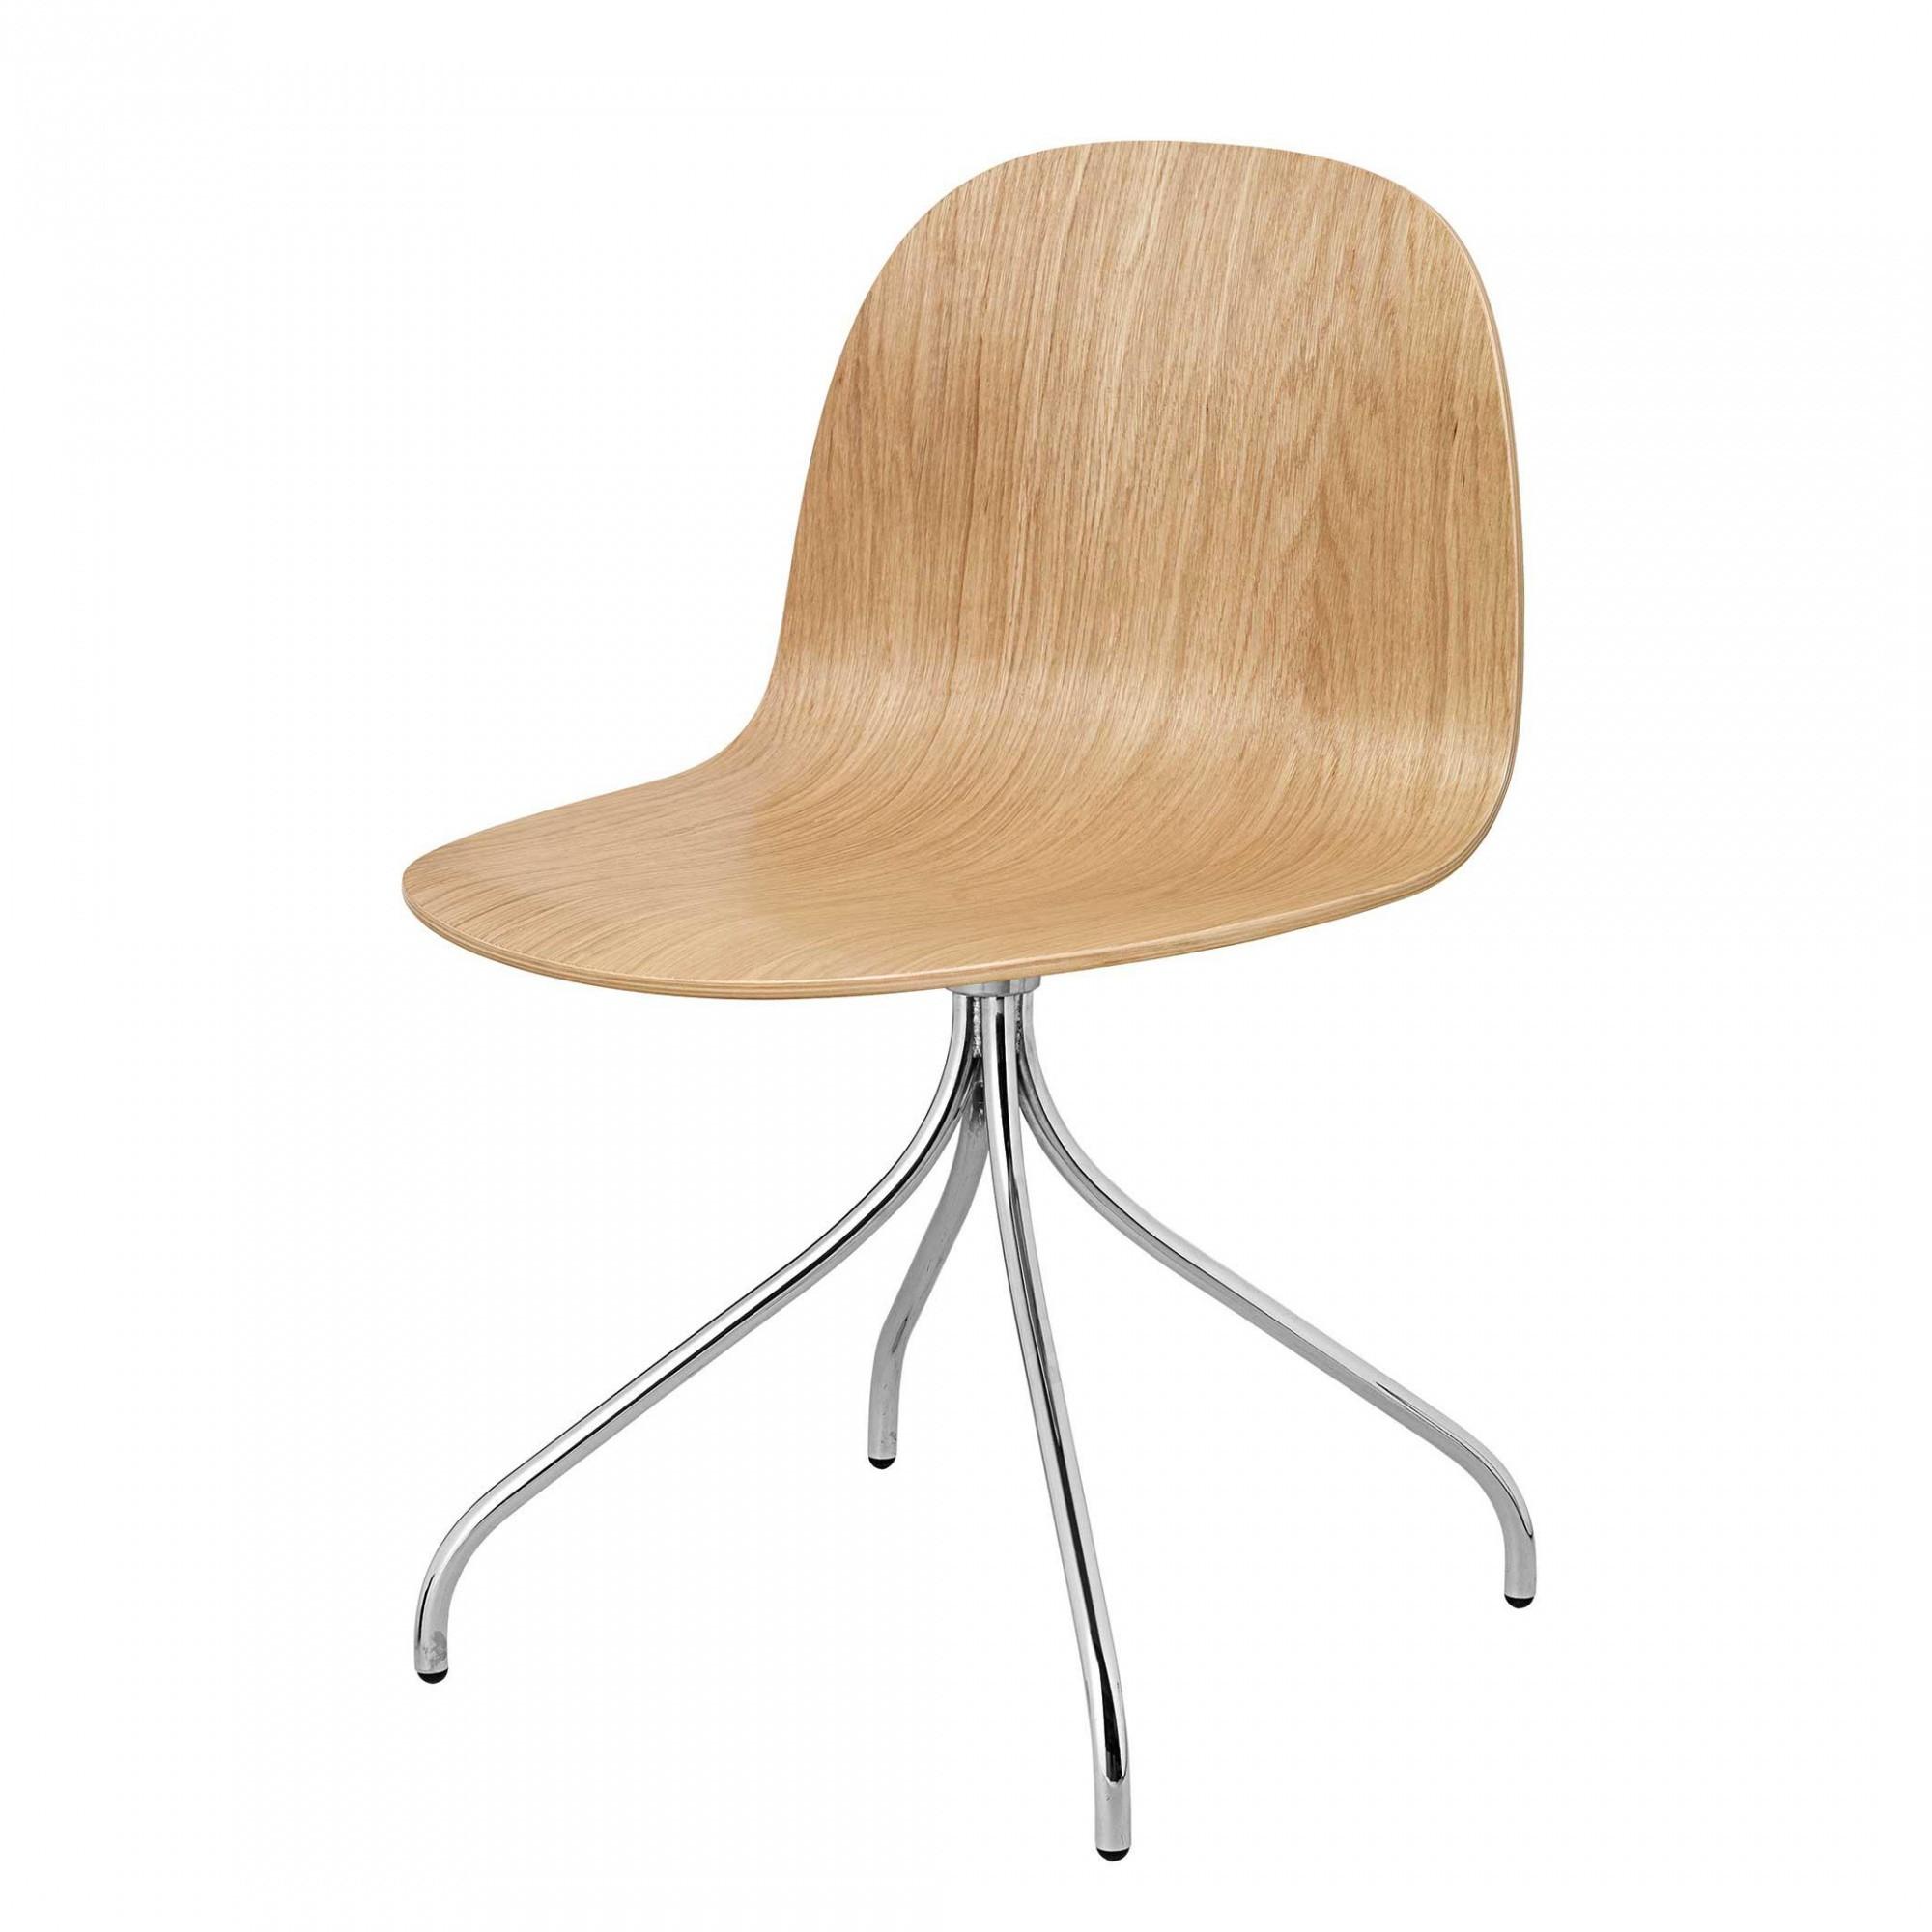 2d Dining Chair Gubi Pivotante Chaise CxedBo